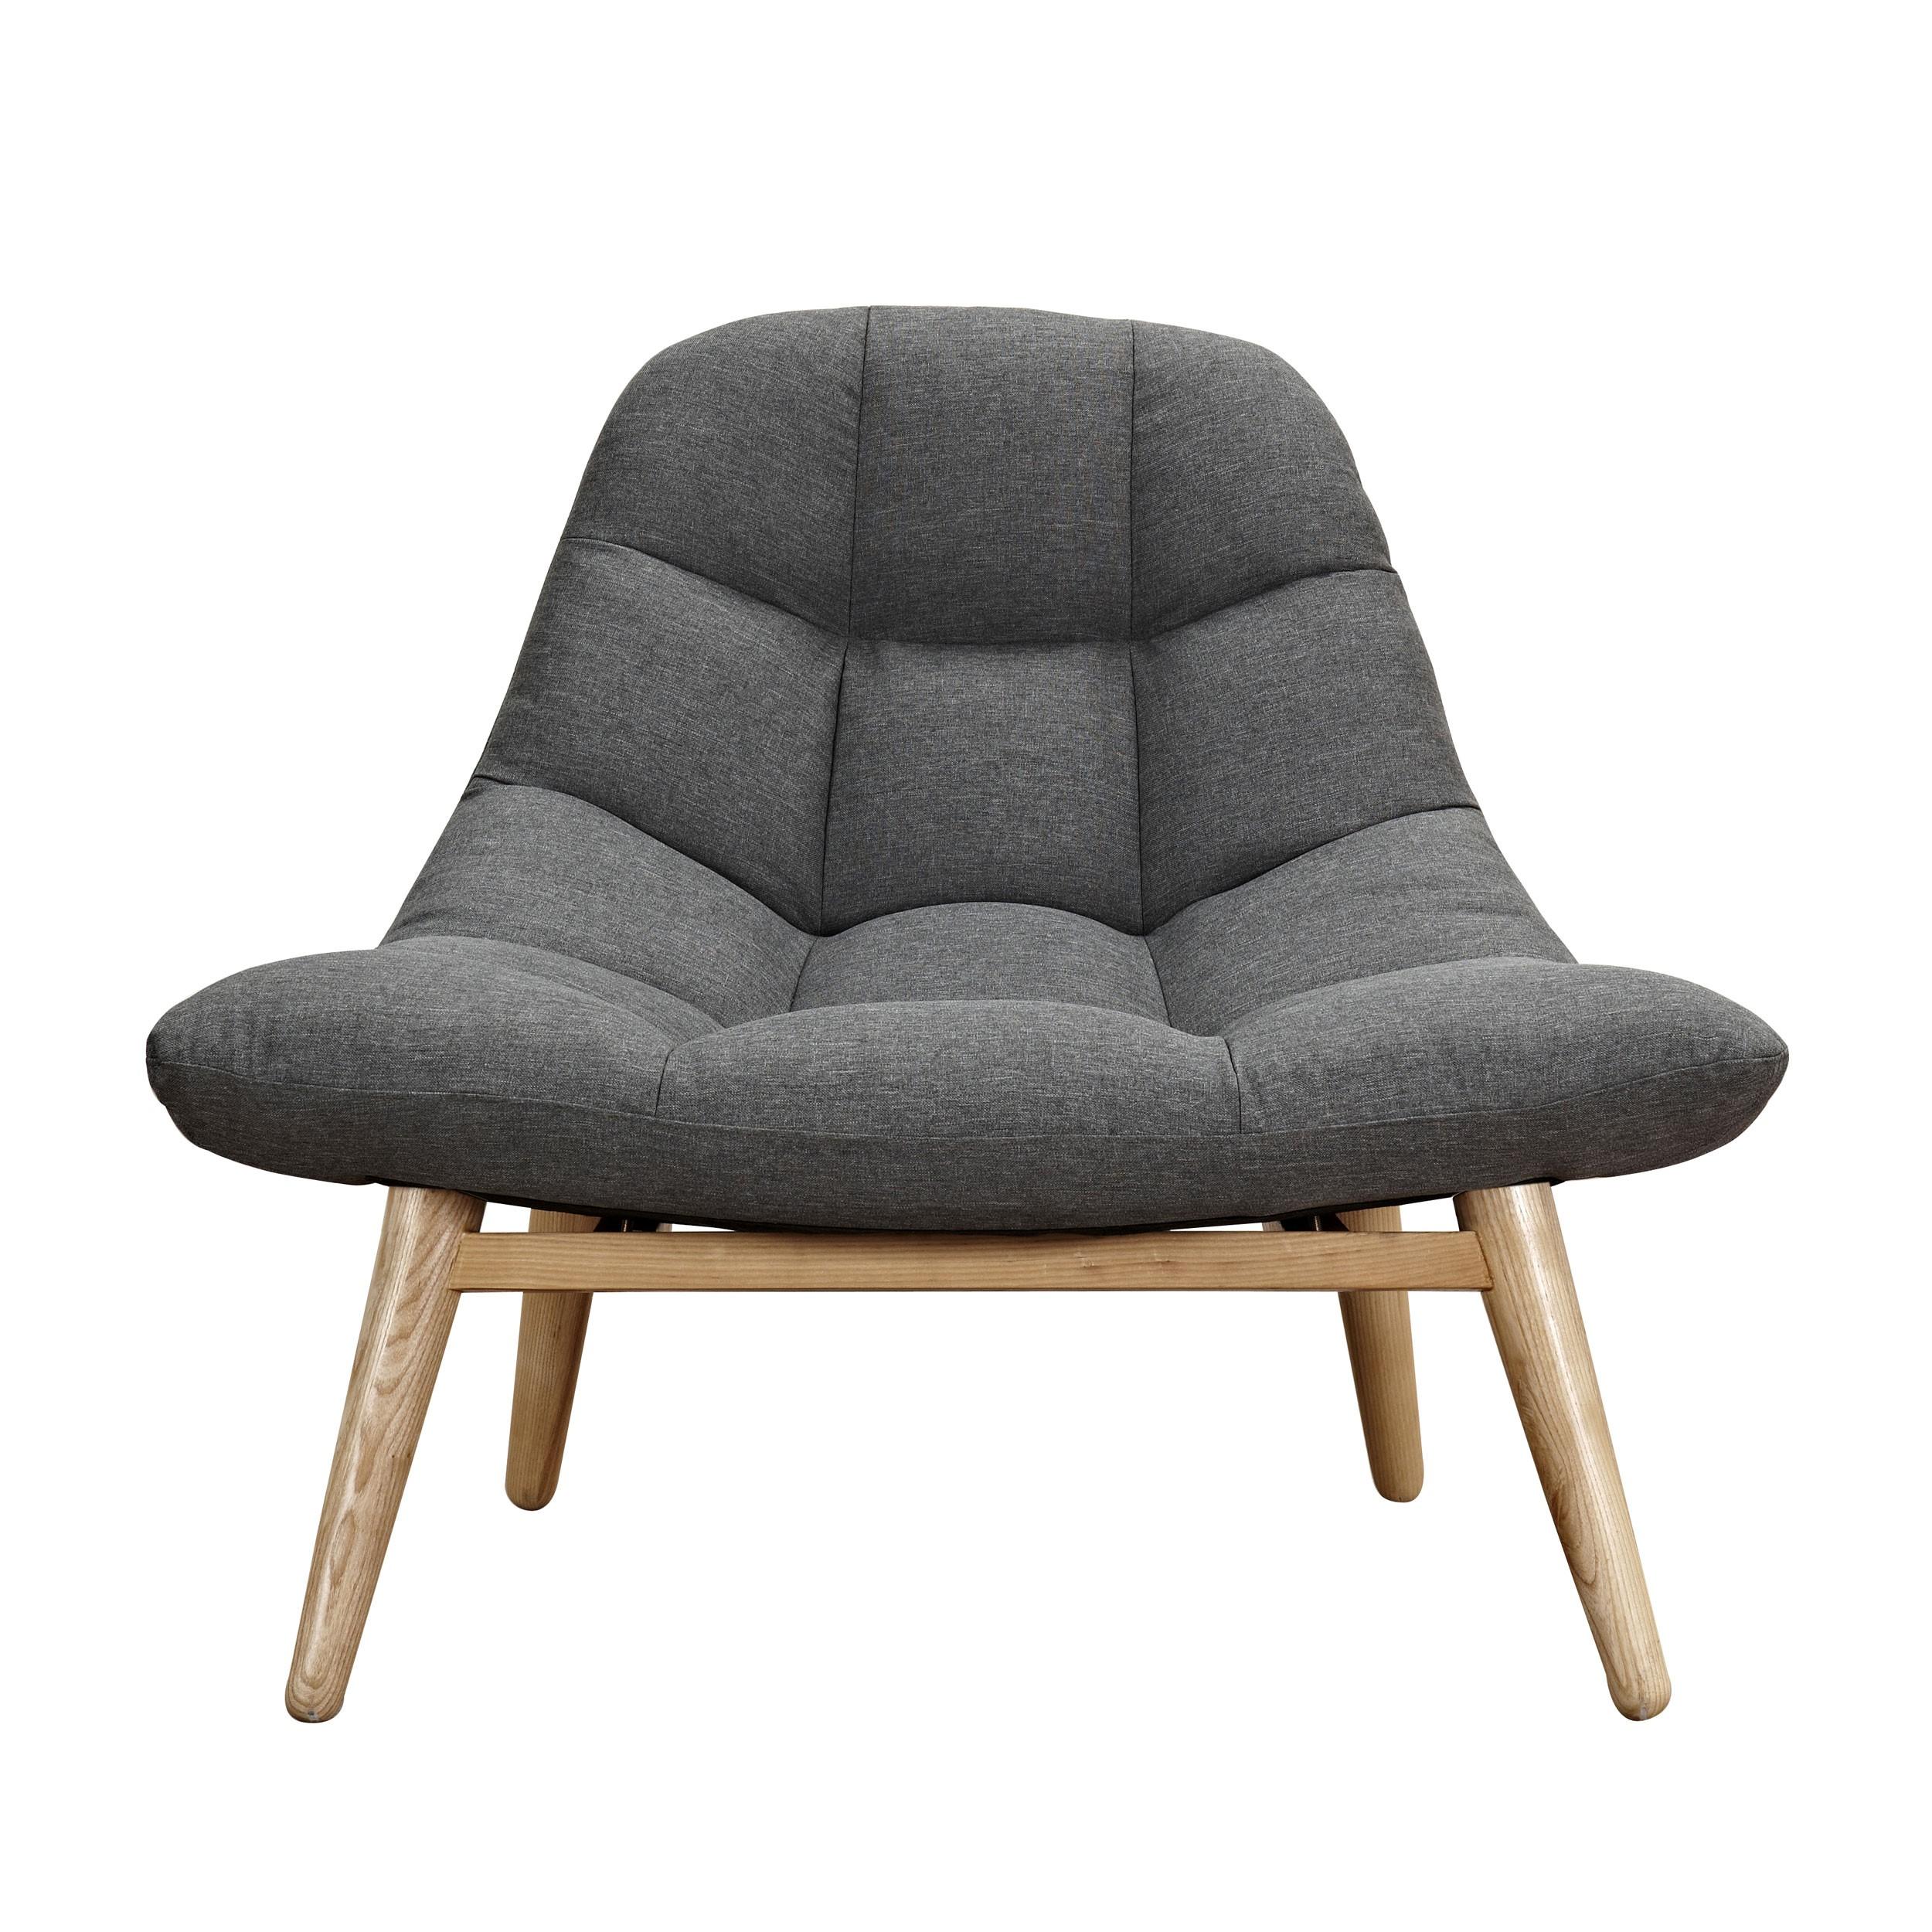 Fauteuil Melby gris anthracite adopez nos fauteuils Melby gris